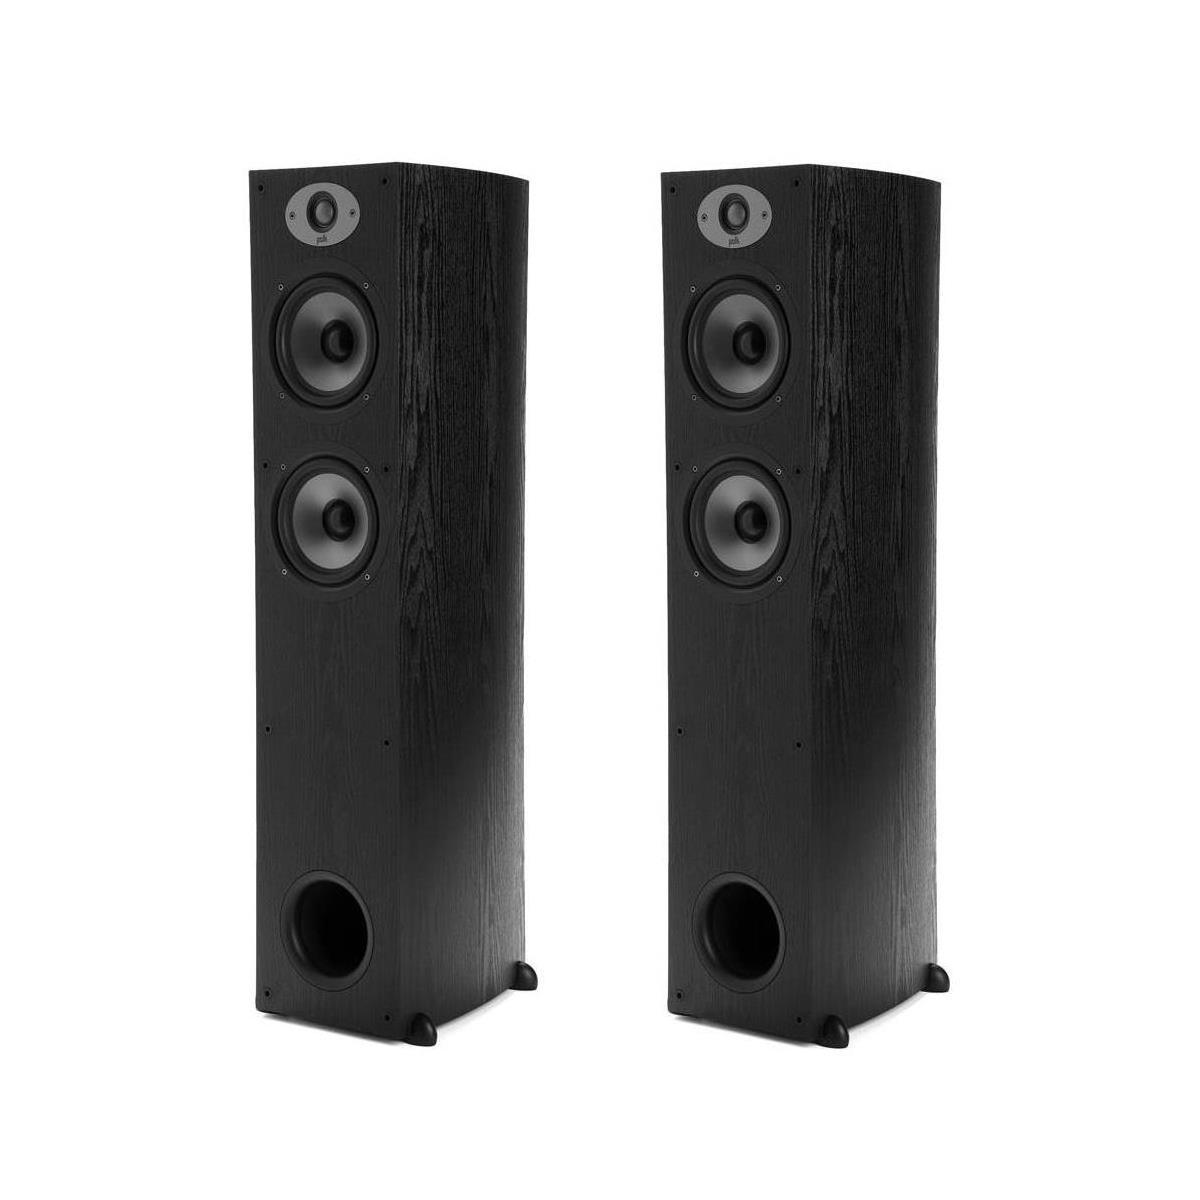 (pair)  Polk Audio TSx 330T 2-Way Floorstanding Tower Speakers $230 + Free Shipping